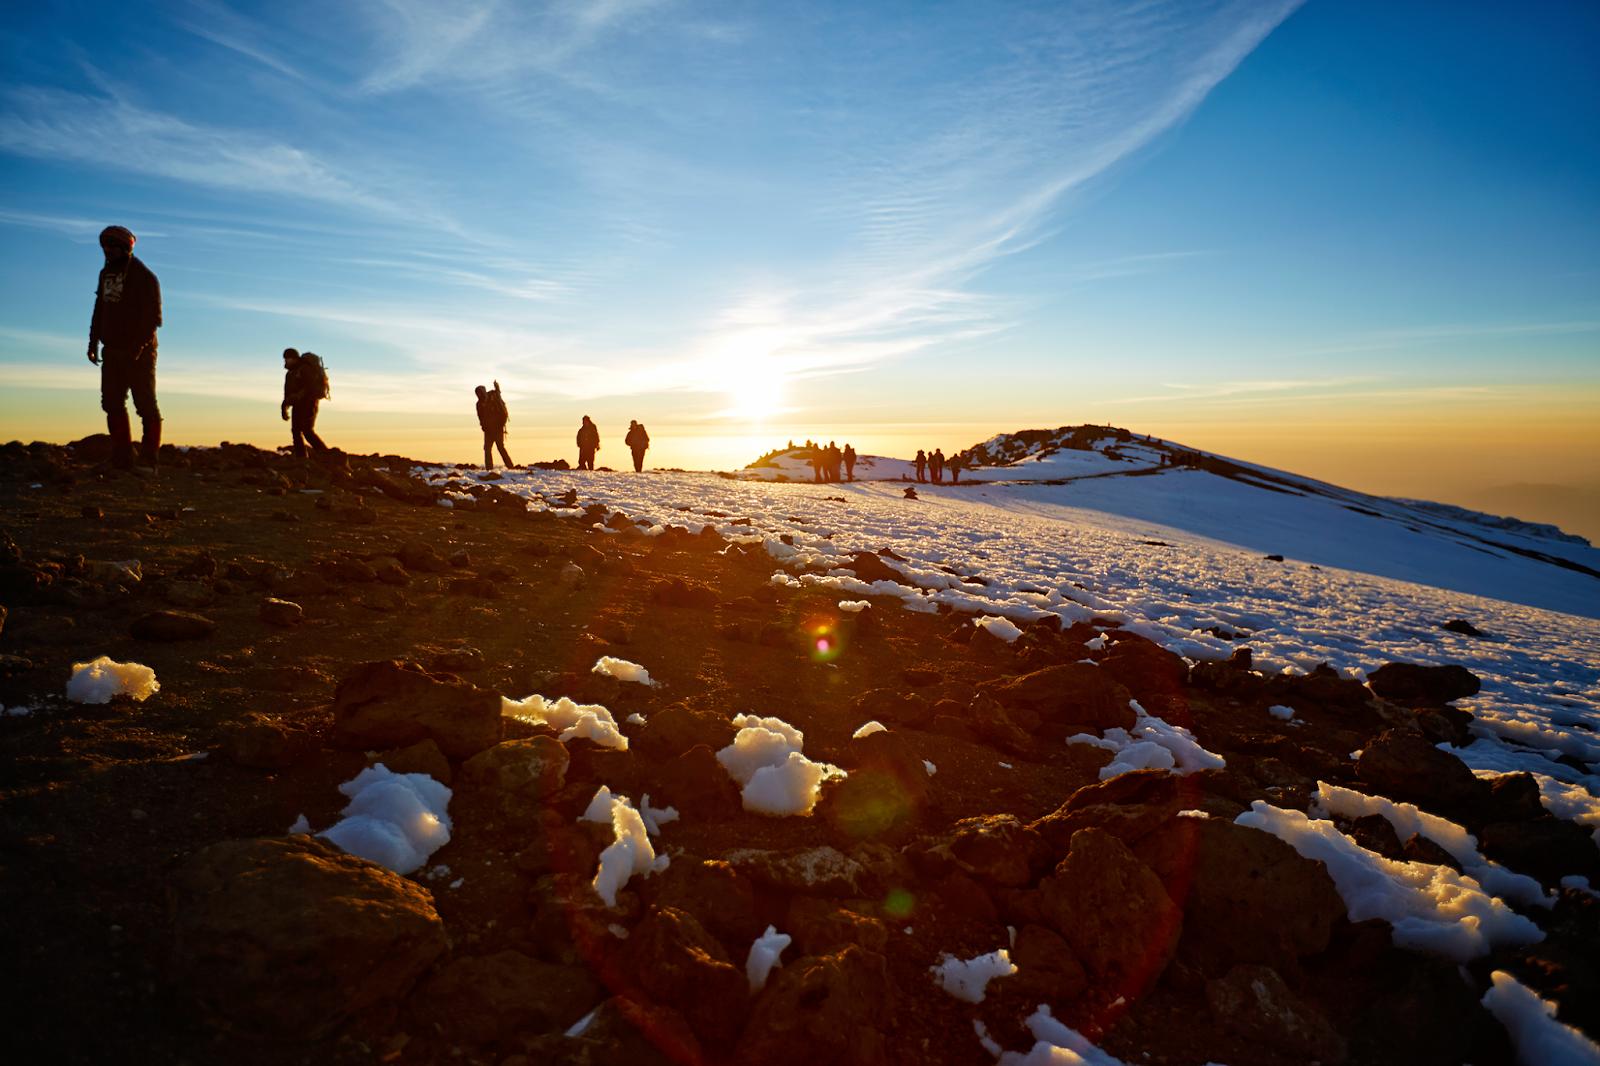 kilimanjaro-rongai-tanzania-day-tours